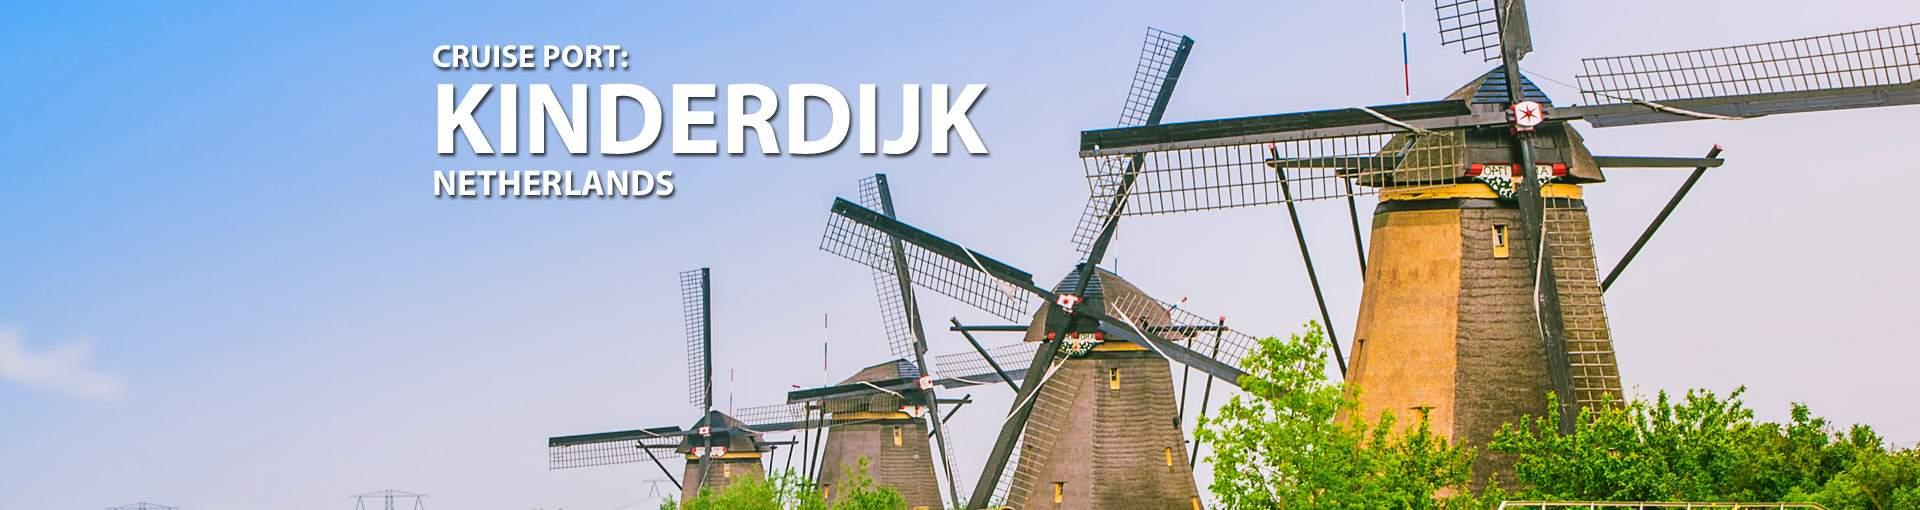 Cruises to Kinderdijk, Netherlands